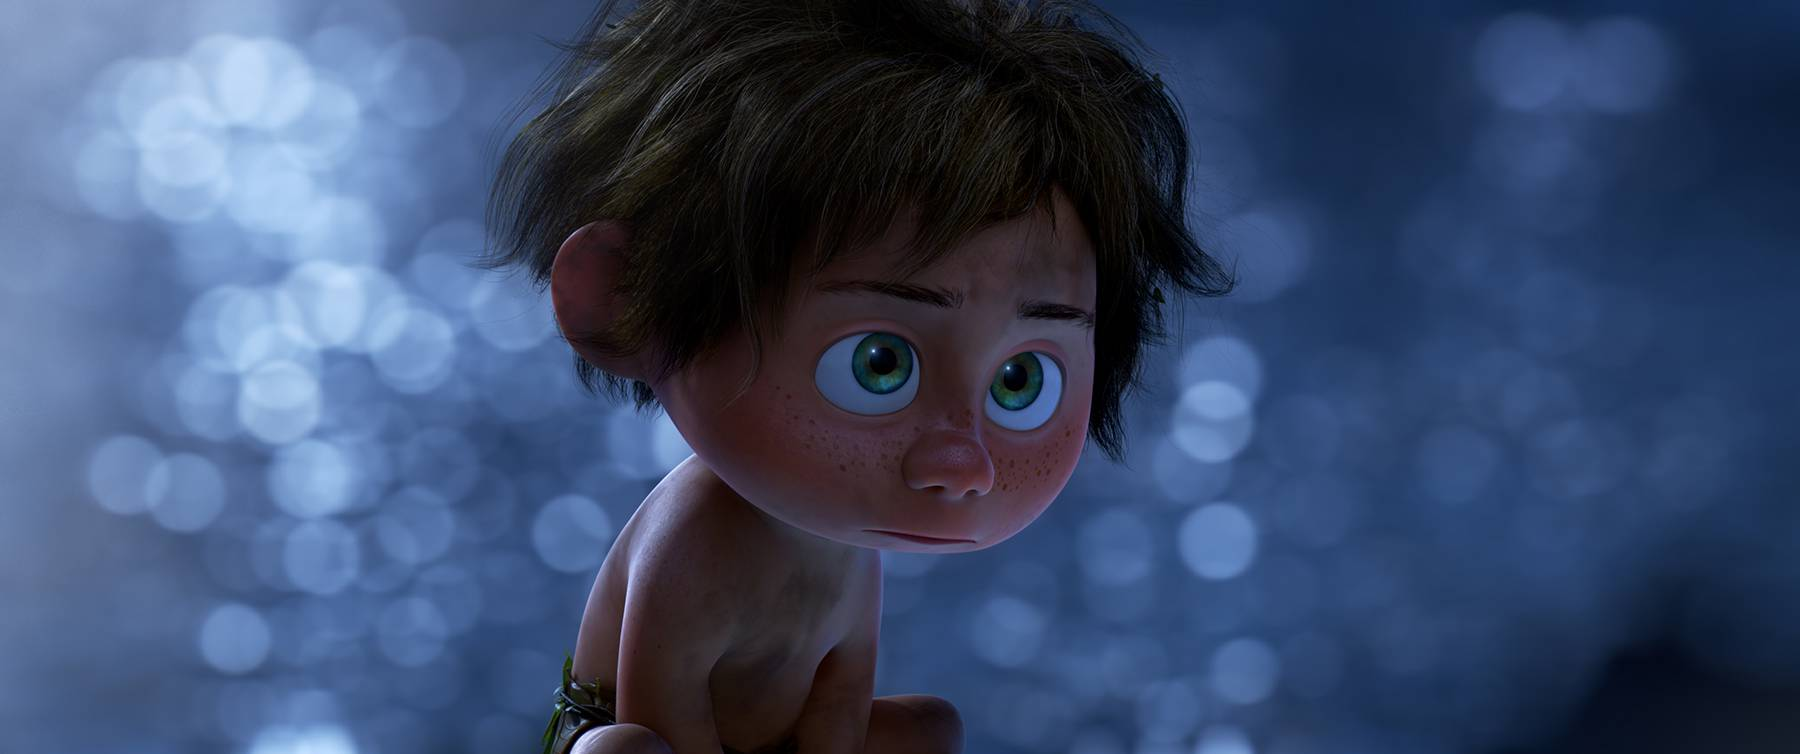 Spot. ©2015 Disney-Pixar